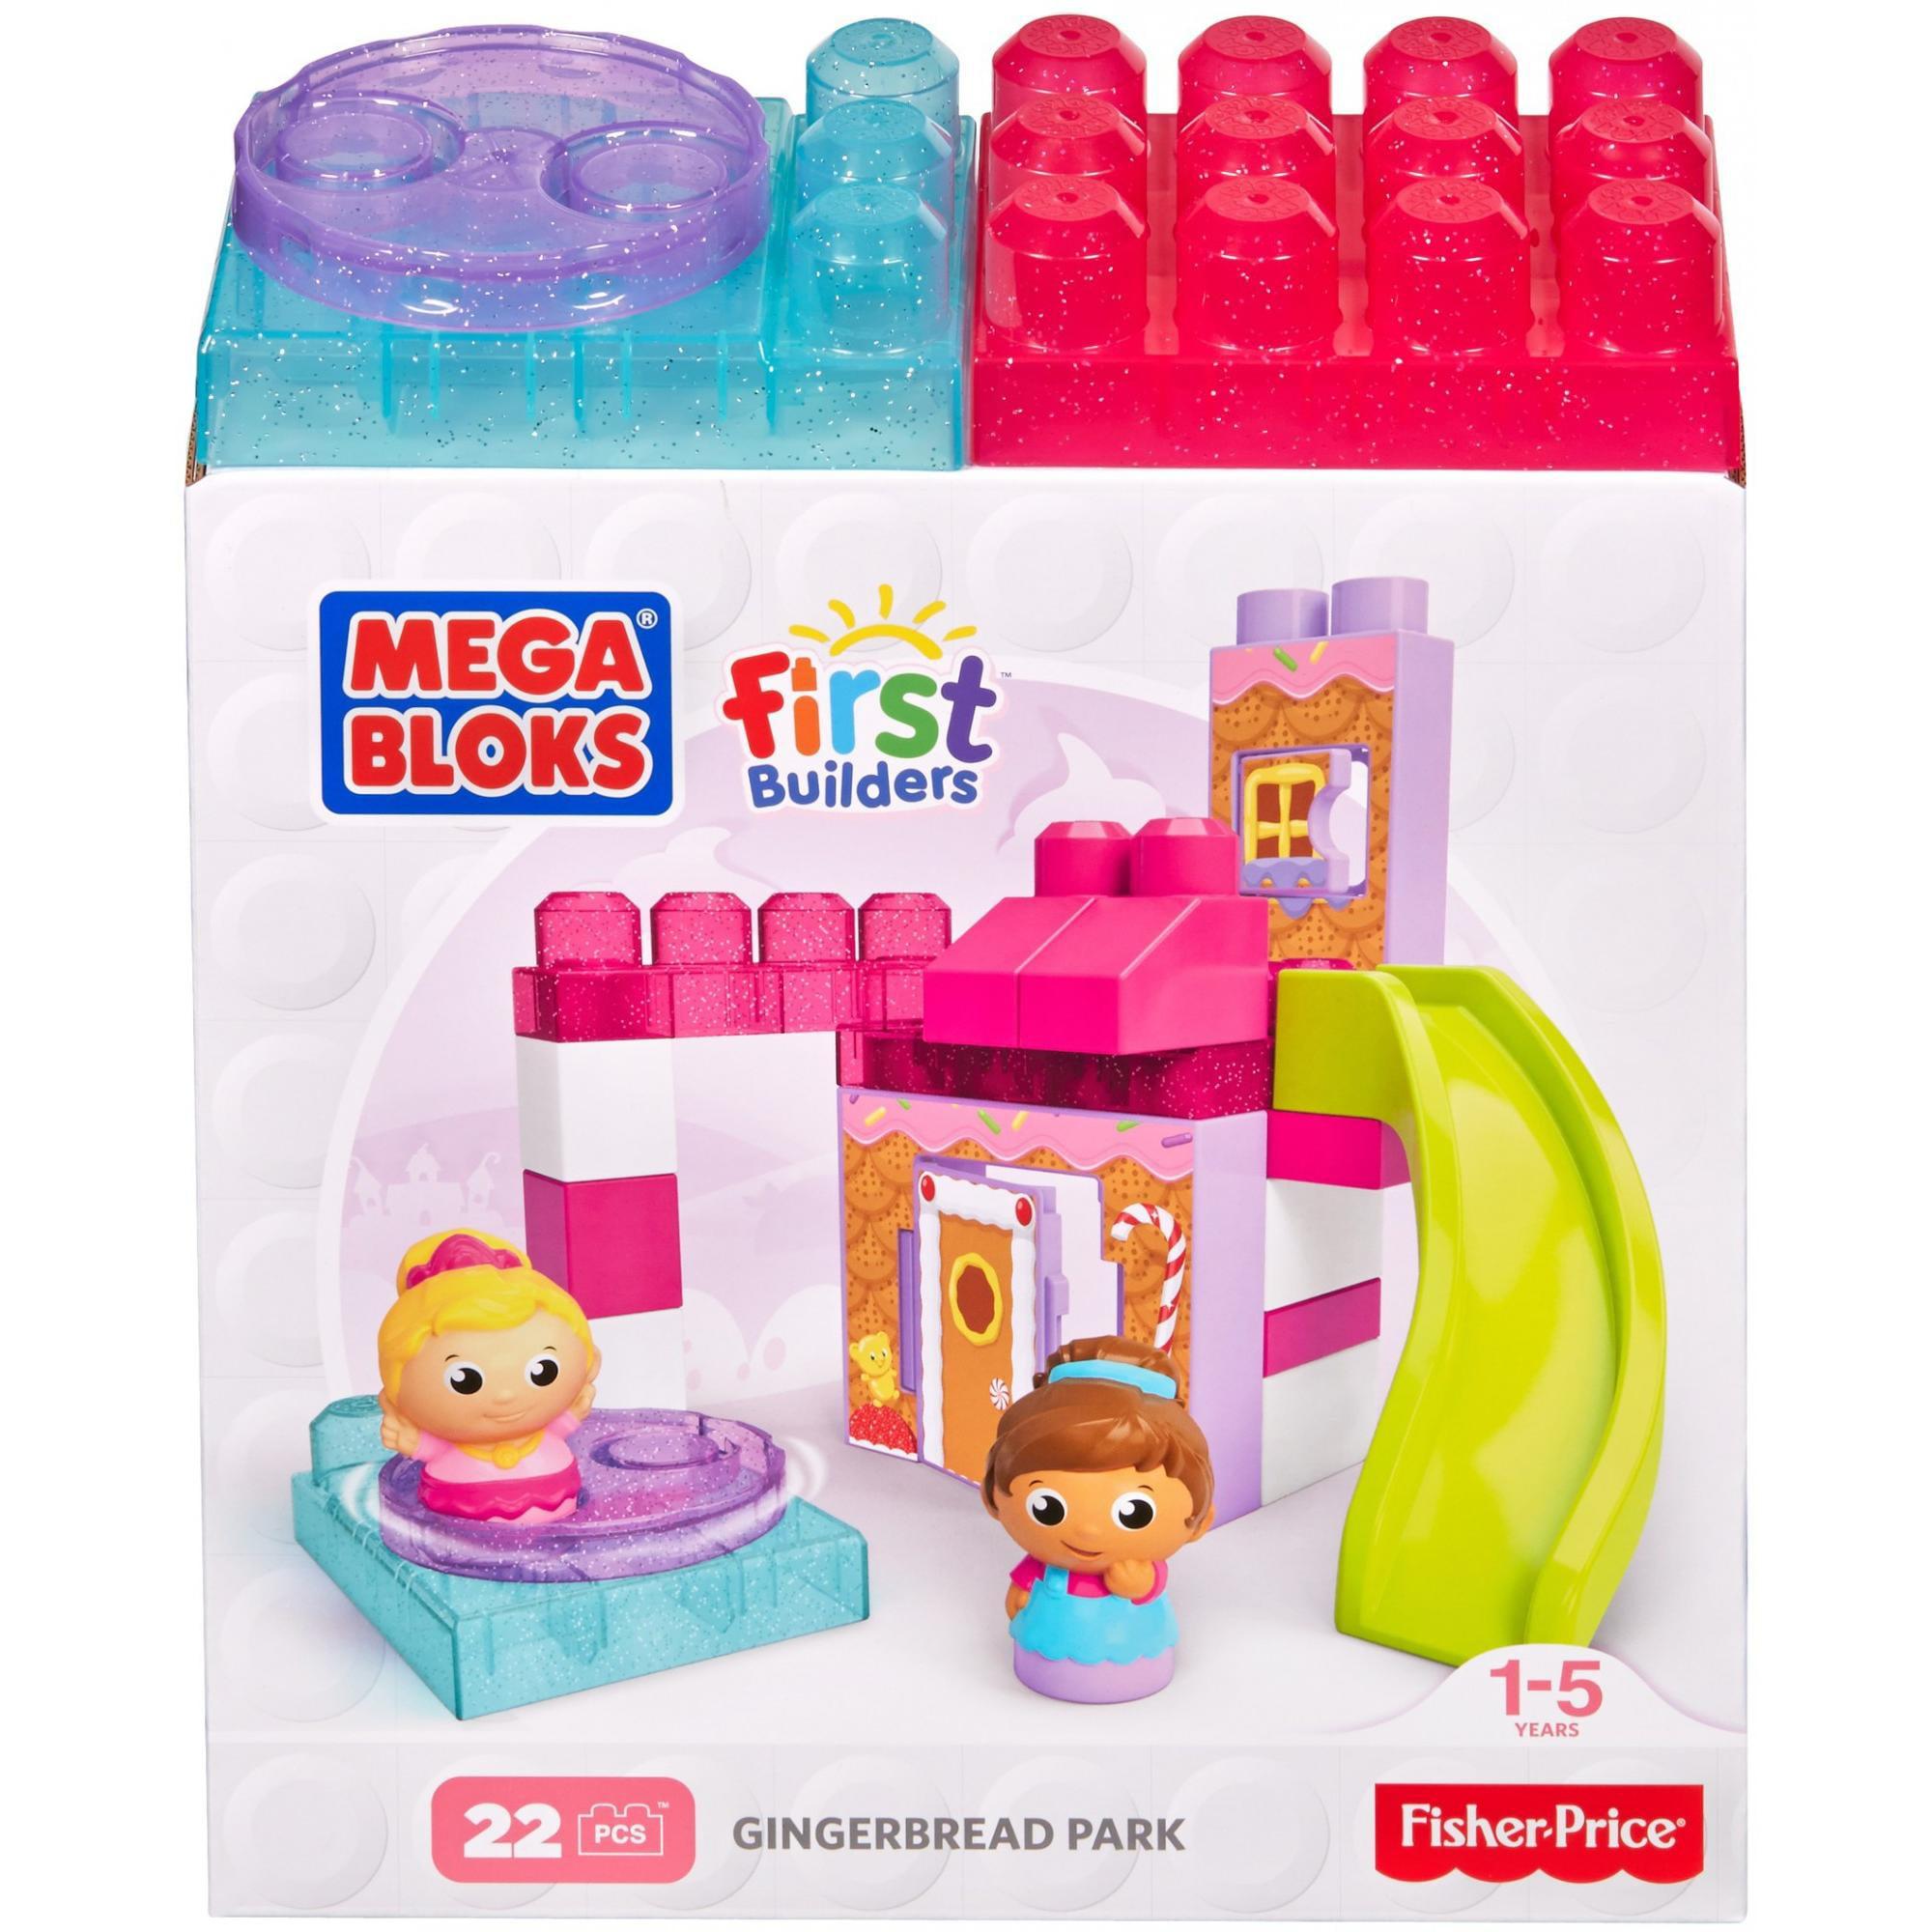 Mega Bloks First Builders Gingerbread Park by Mattel